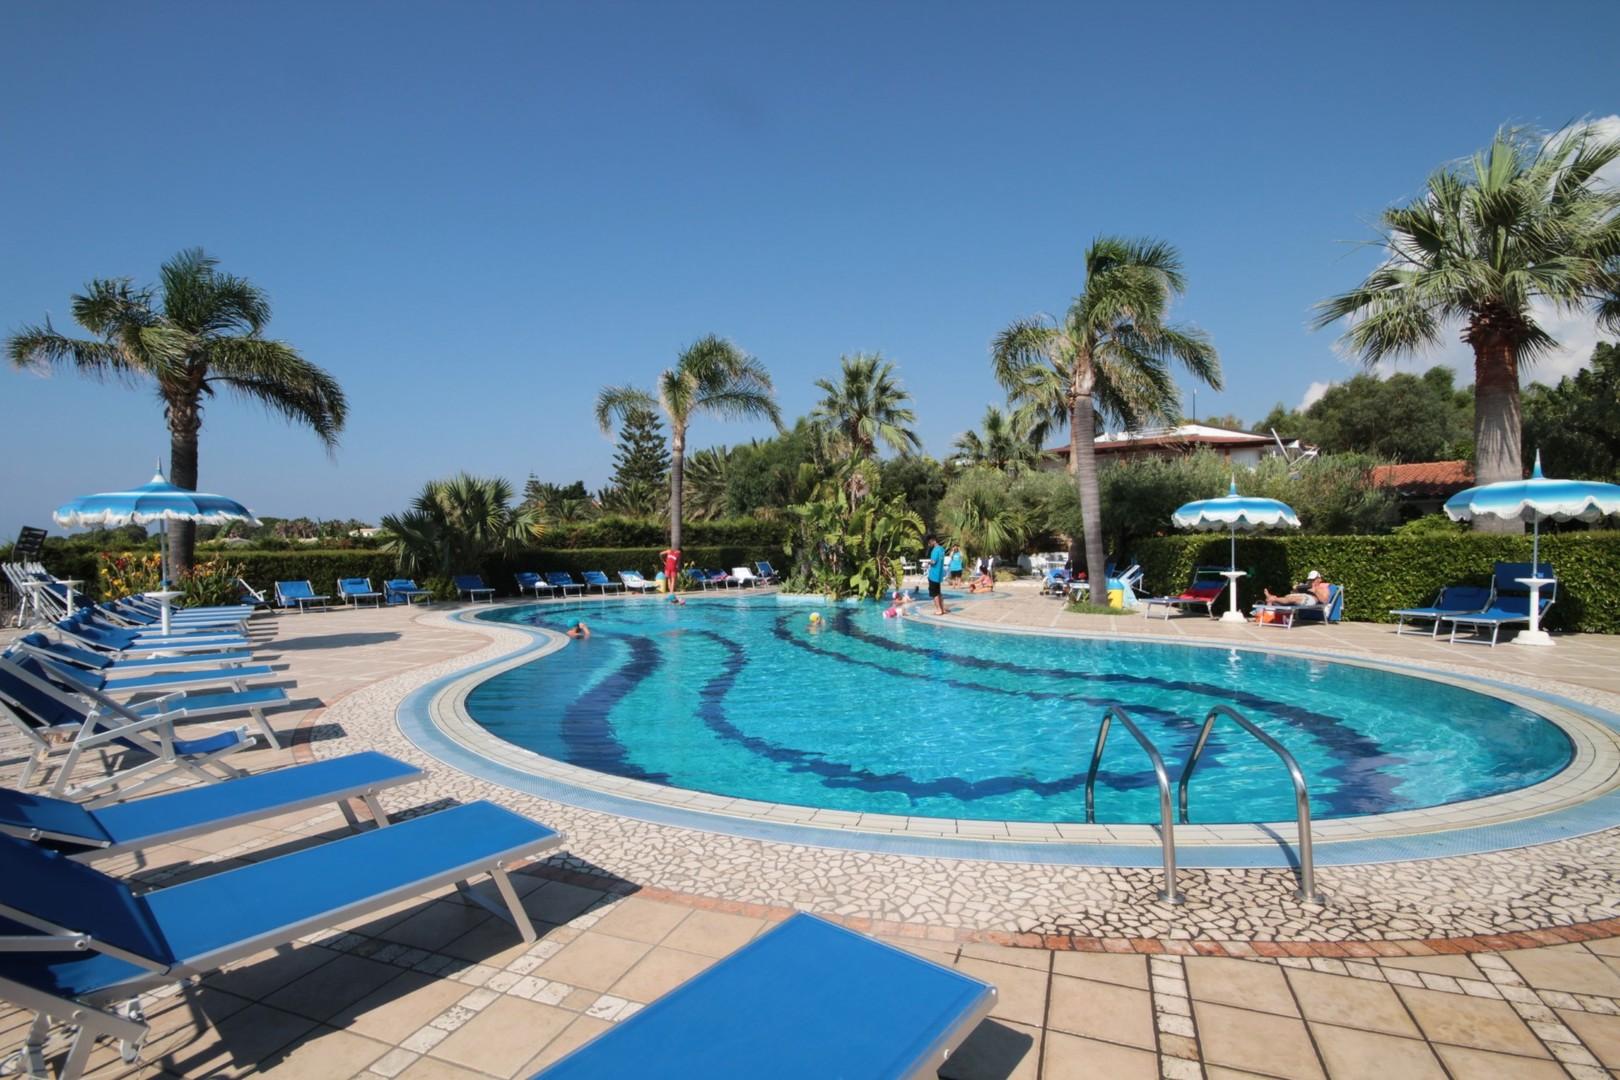 Hotel Tonicello Resort